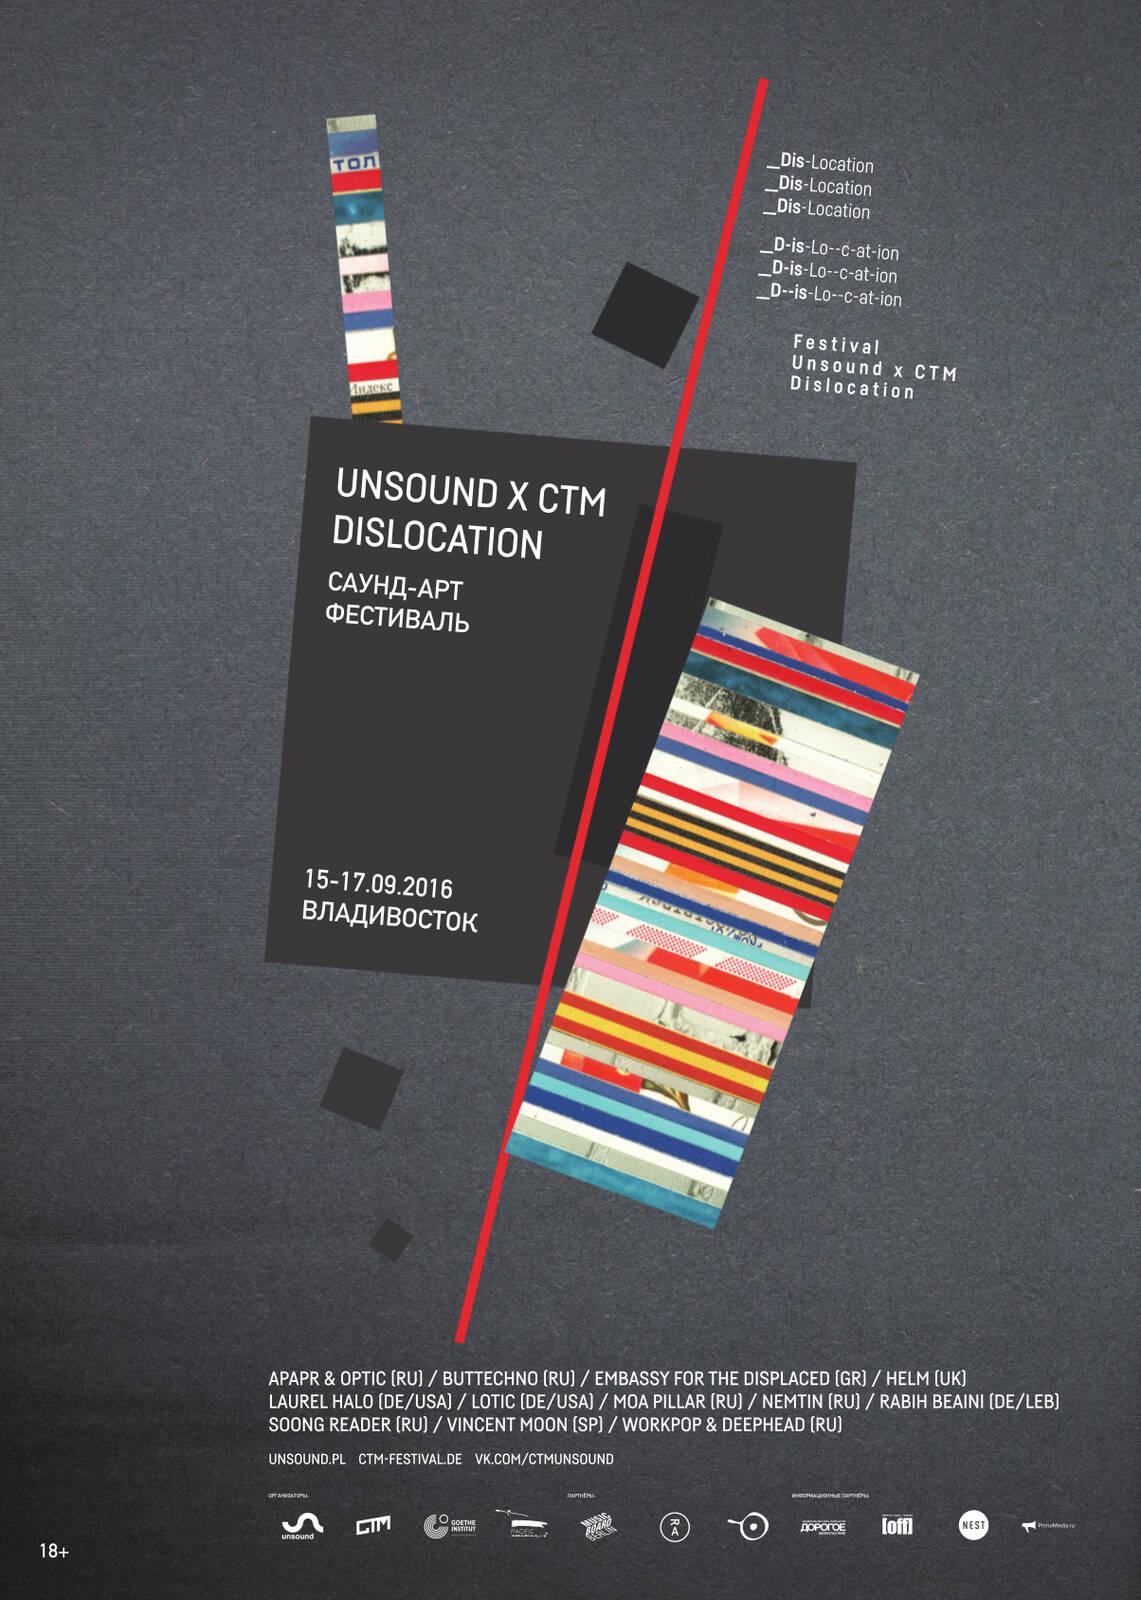 Unsound x CTM Dislocation: Vladivostok